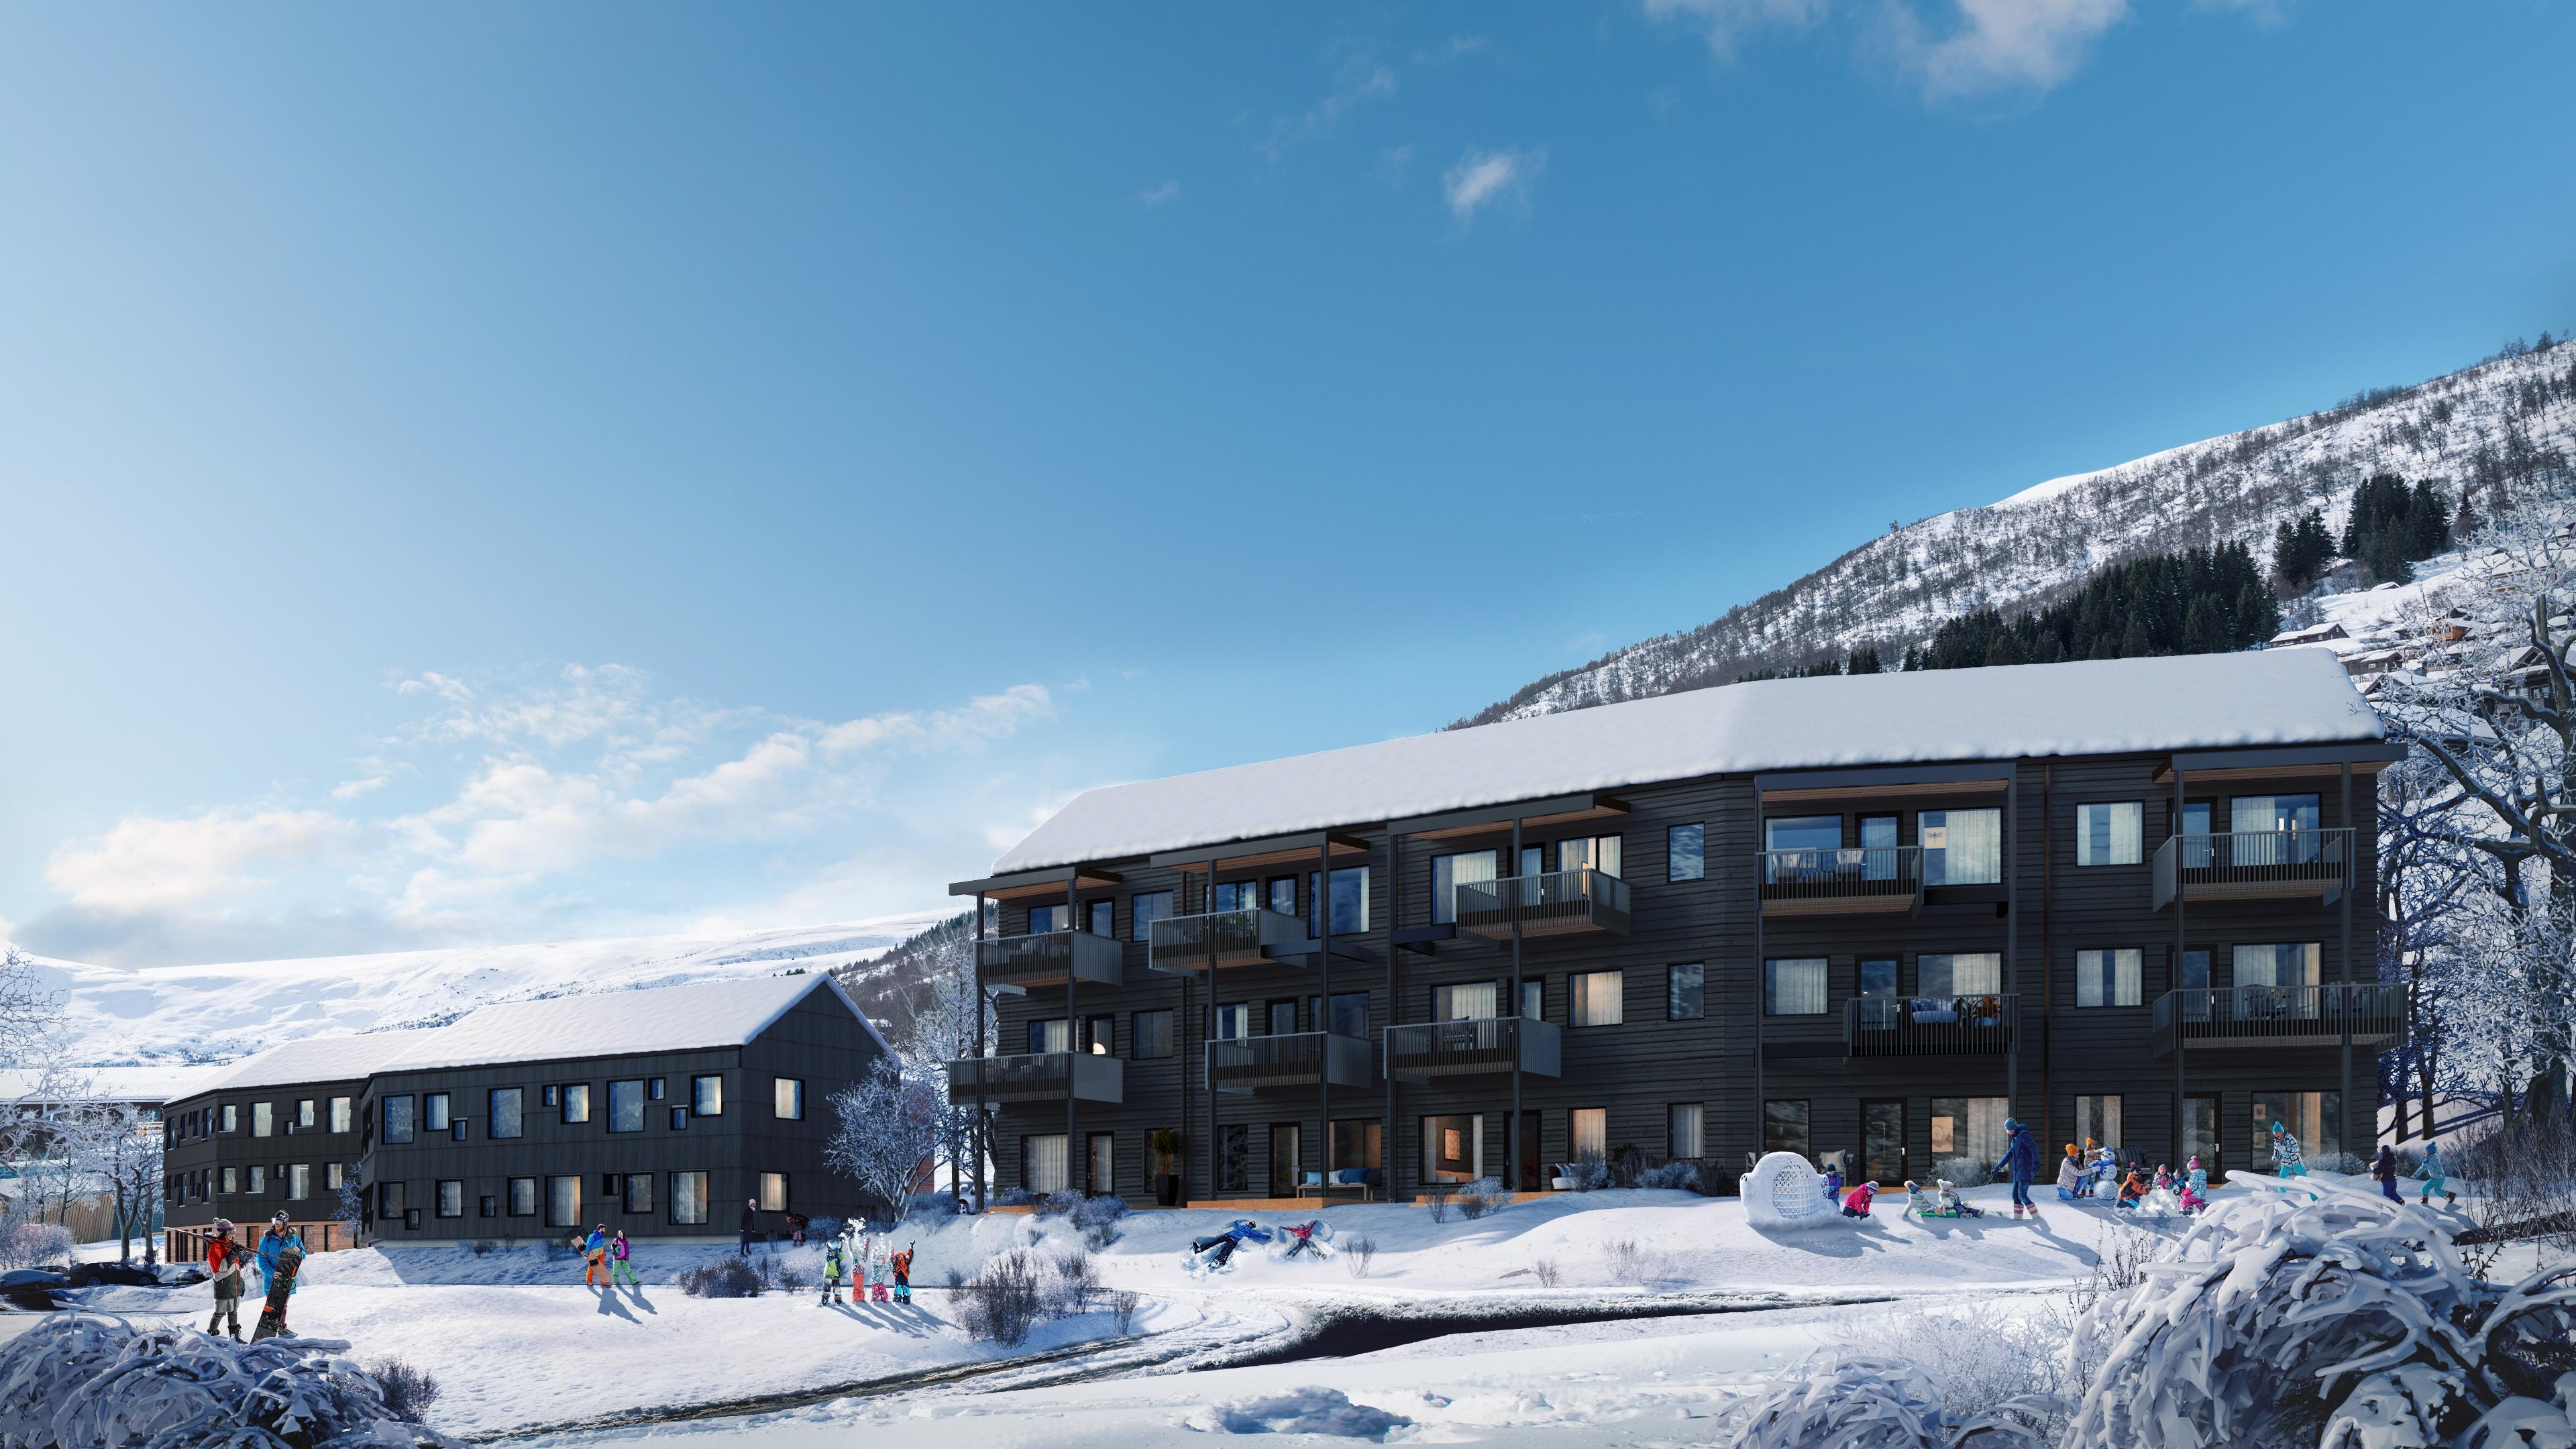 Svoletunet - prisvennlige leiligheter i Myrkdalen Fjellandsby